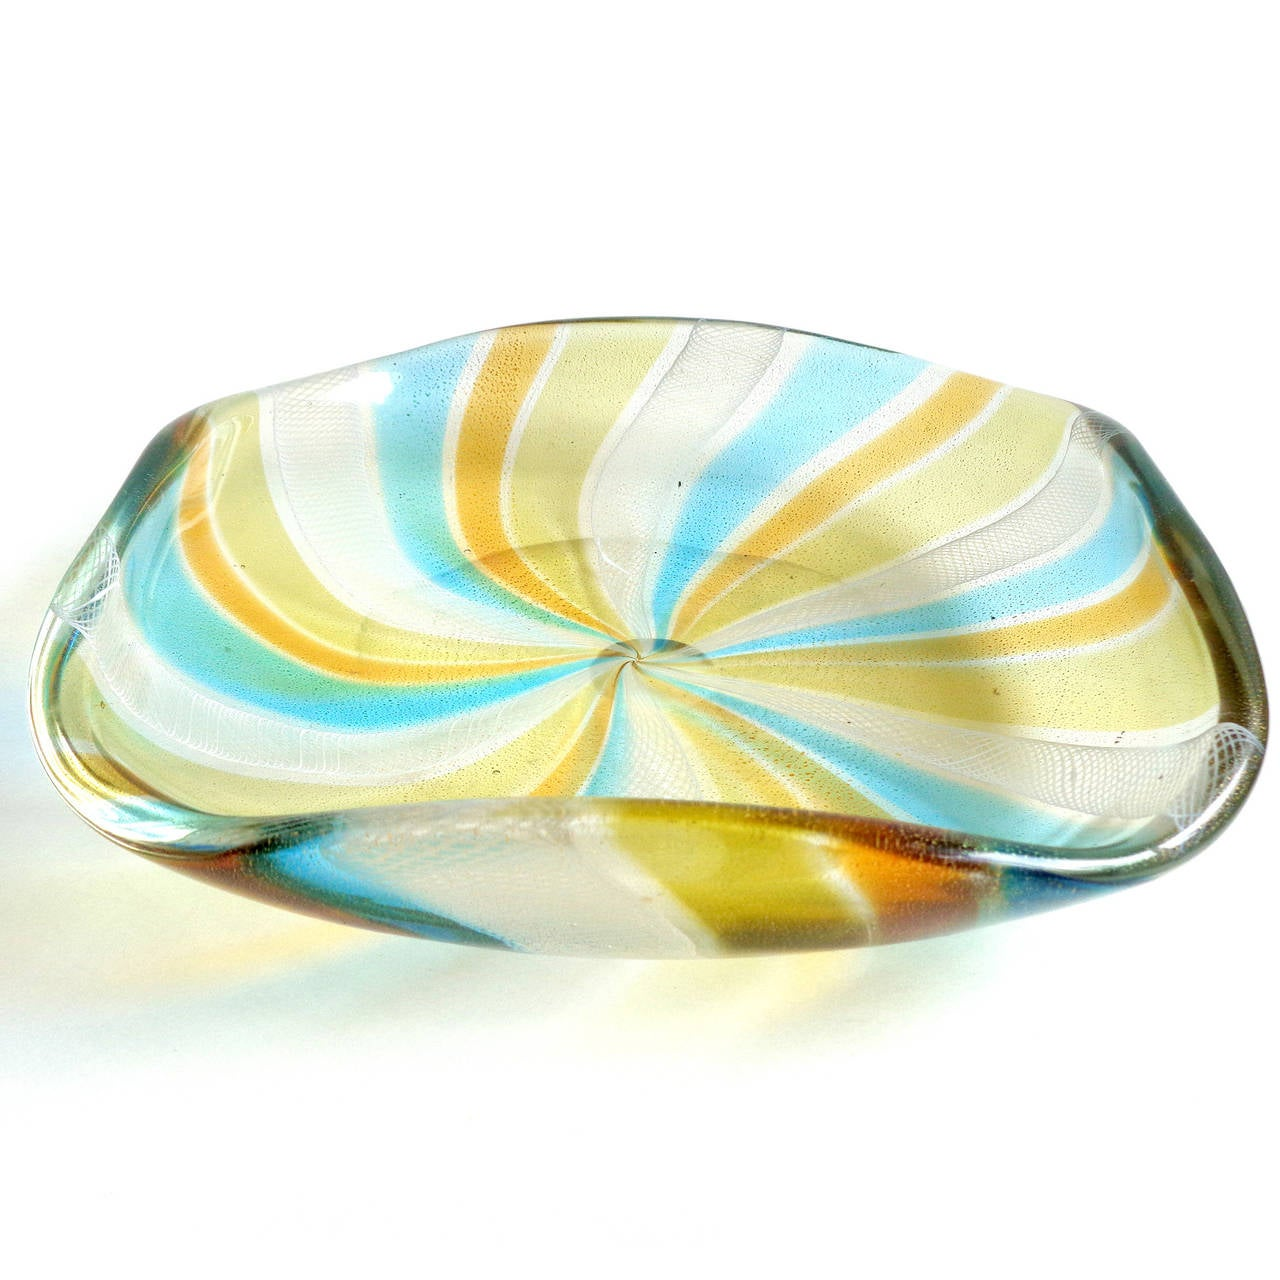 Gold Decorative Bowl Similiar Gold Decorative Bowls Keywords